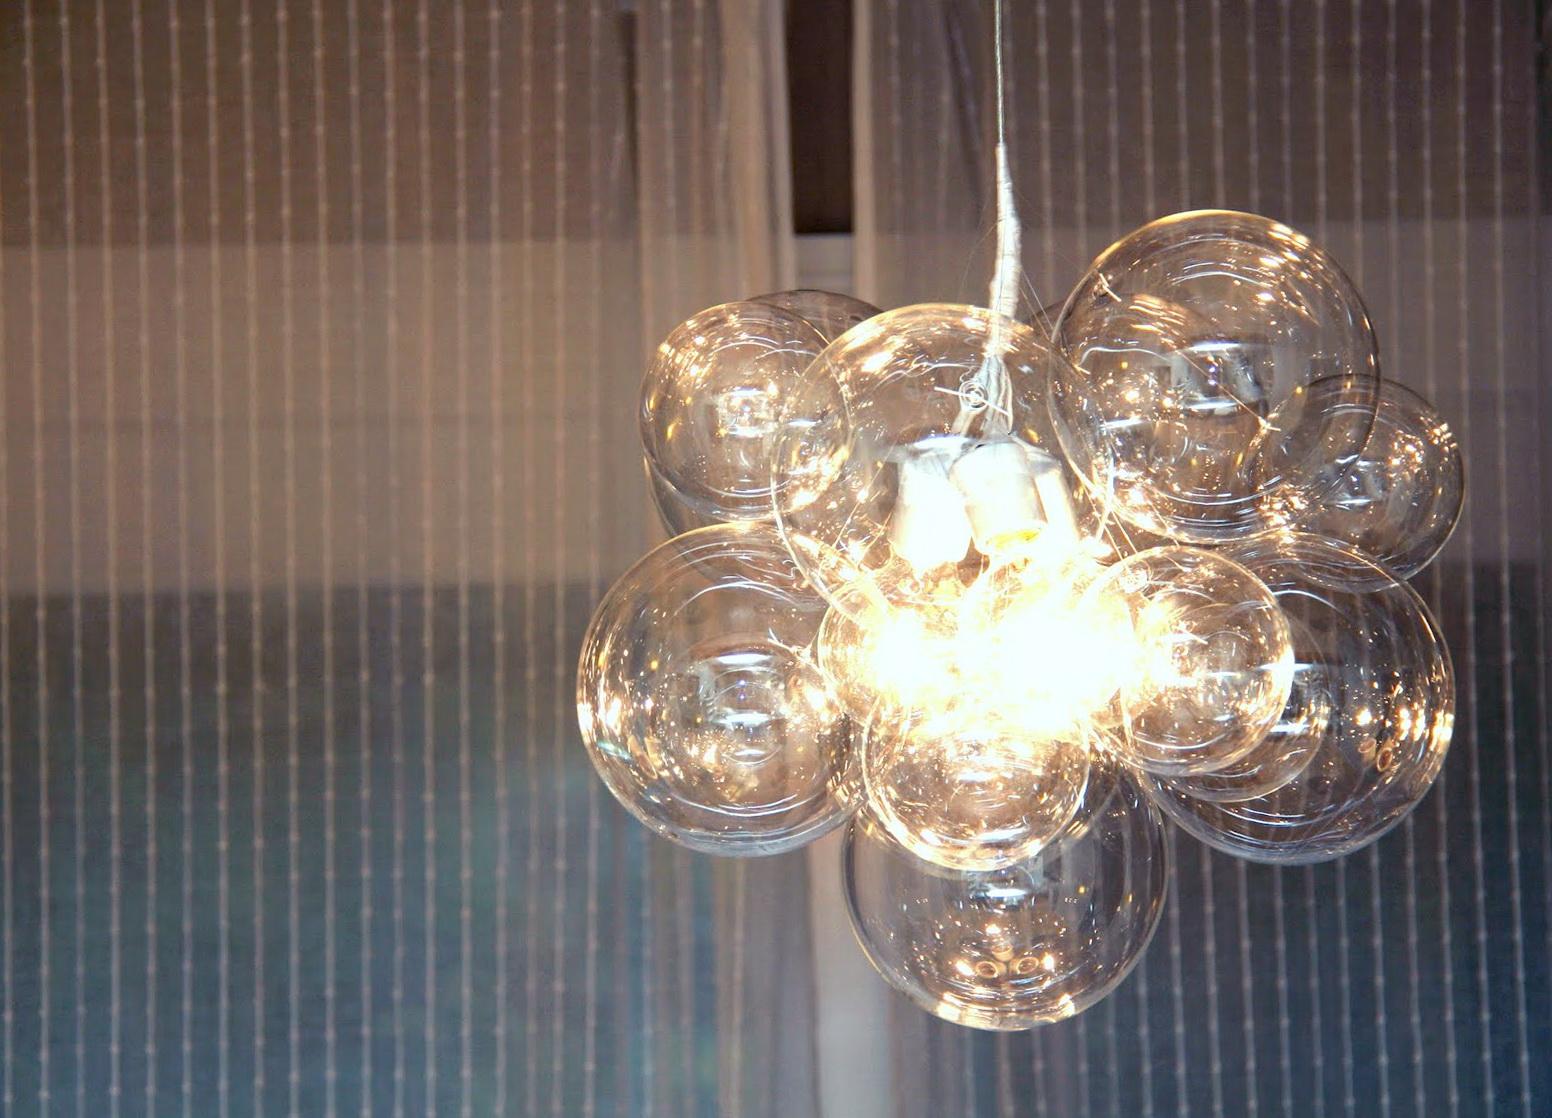 Diy bubble chandelier tutorial home design ideas diy bubble chandelier tutorial aloadofball Image collections